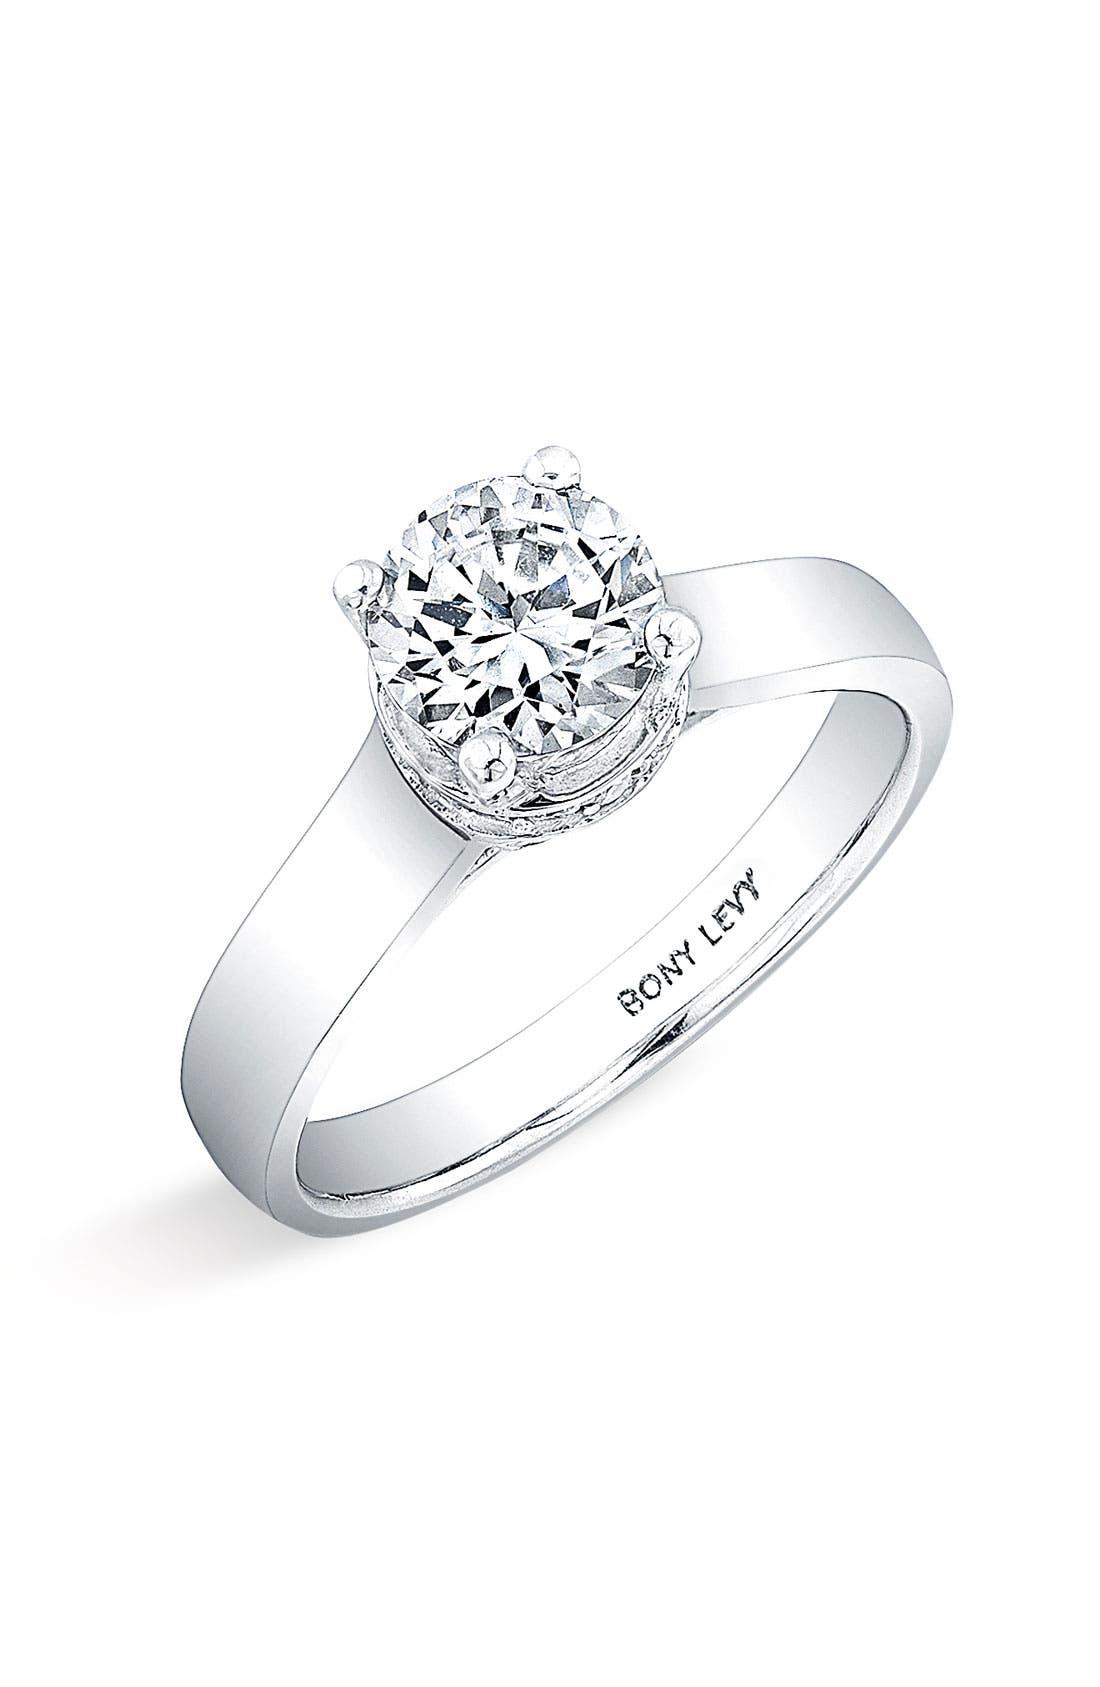 BONY LEVY Diamond Pavé Framed Basket Engagement Ring Setting